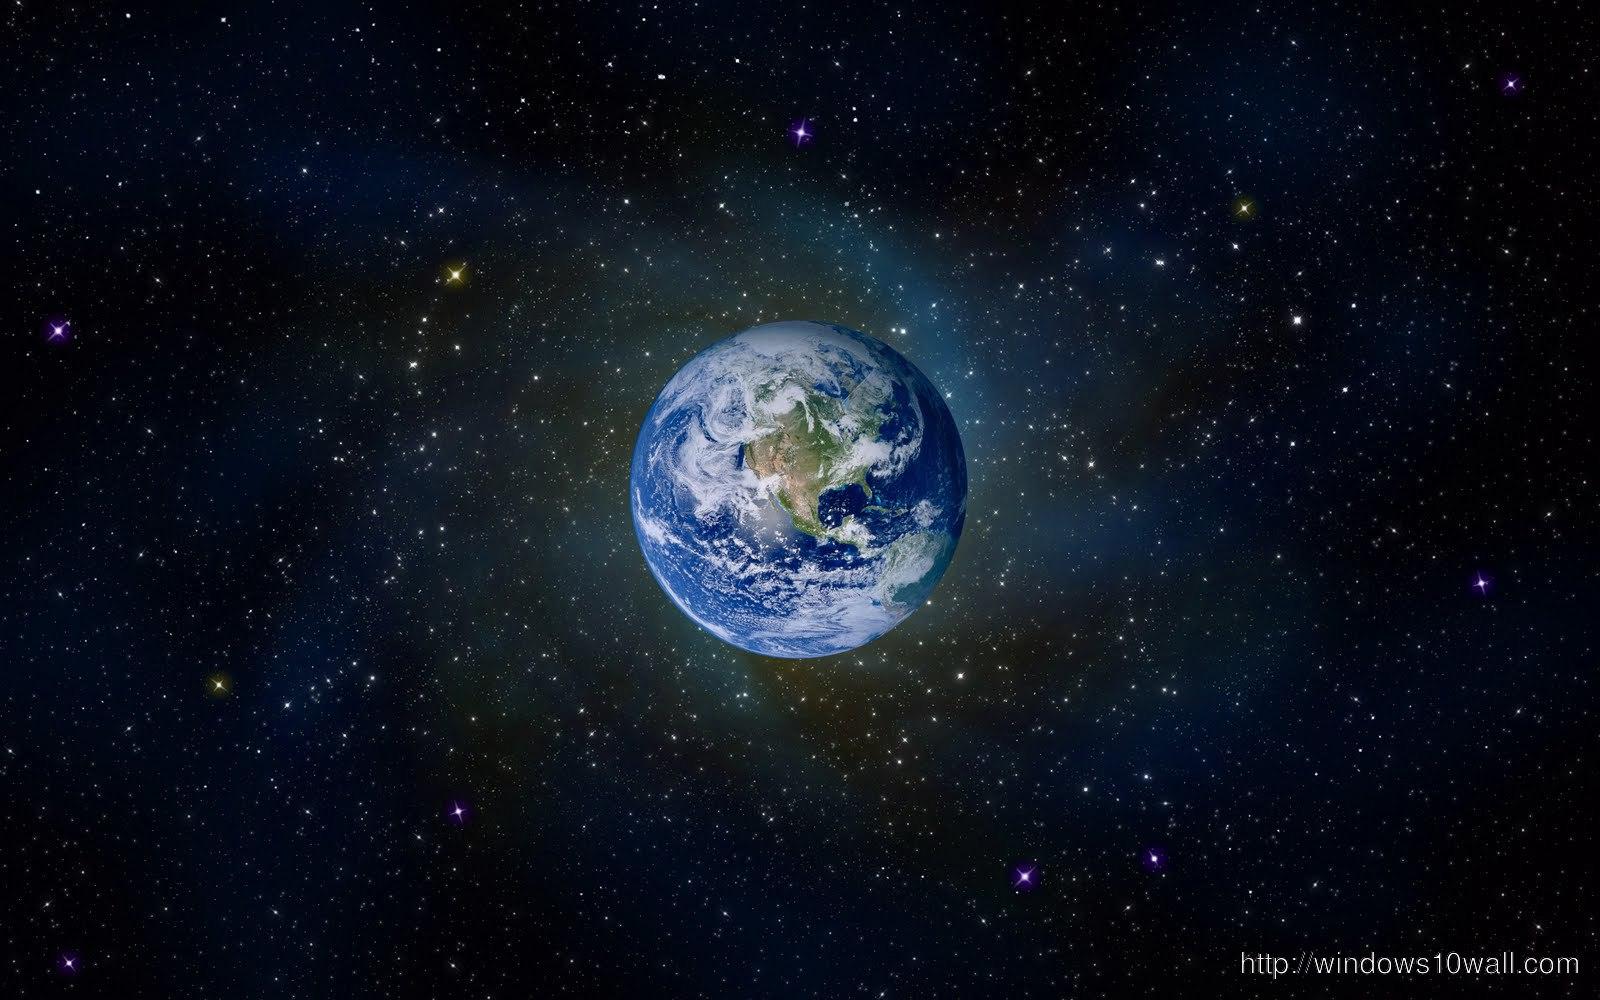 49+ Live Earth Wallpaper Windows 10 on WallpaperSafari